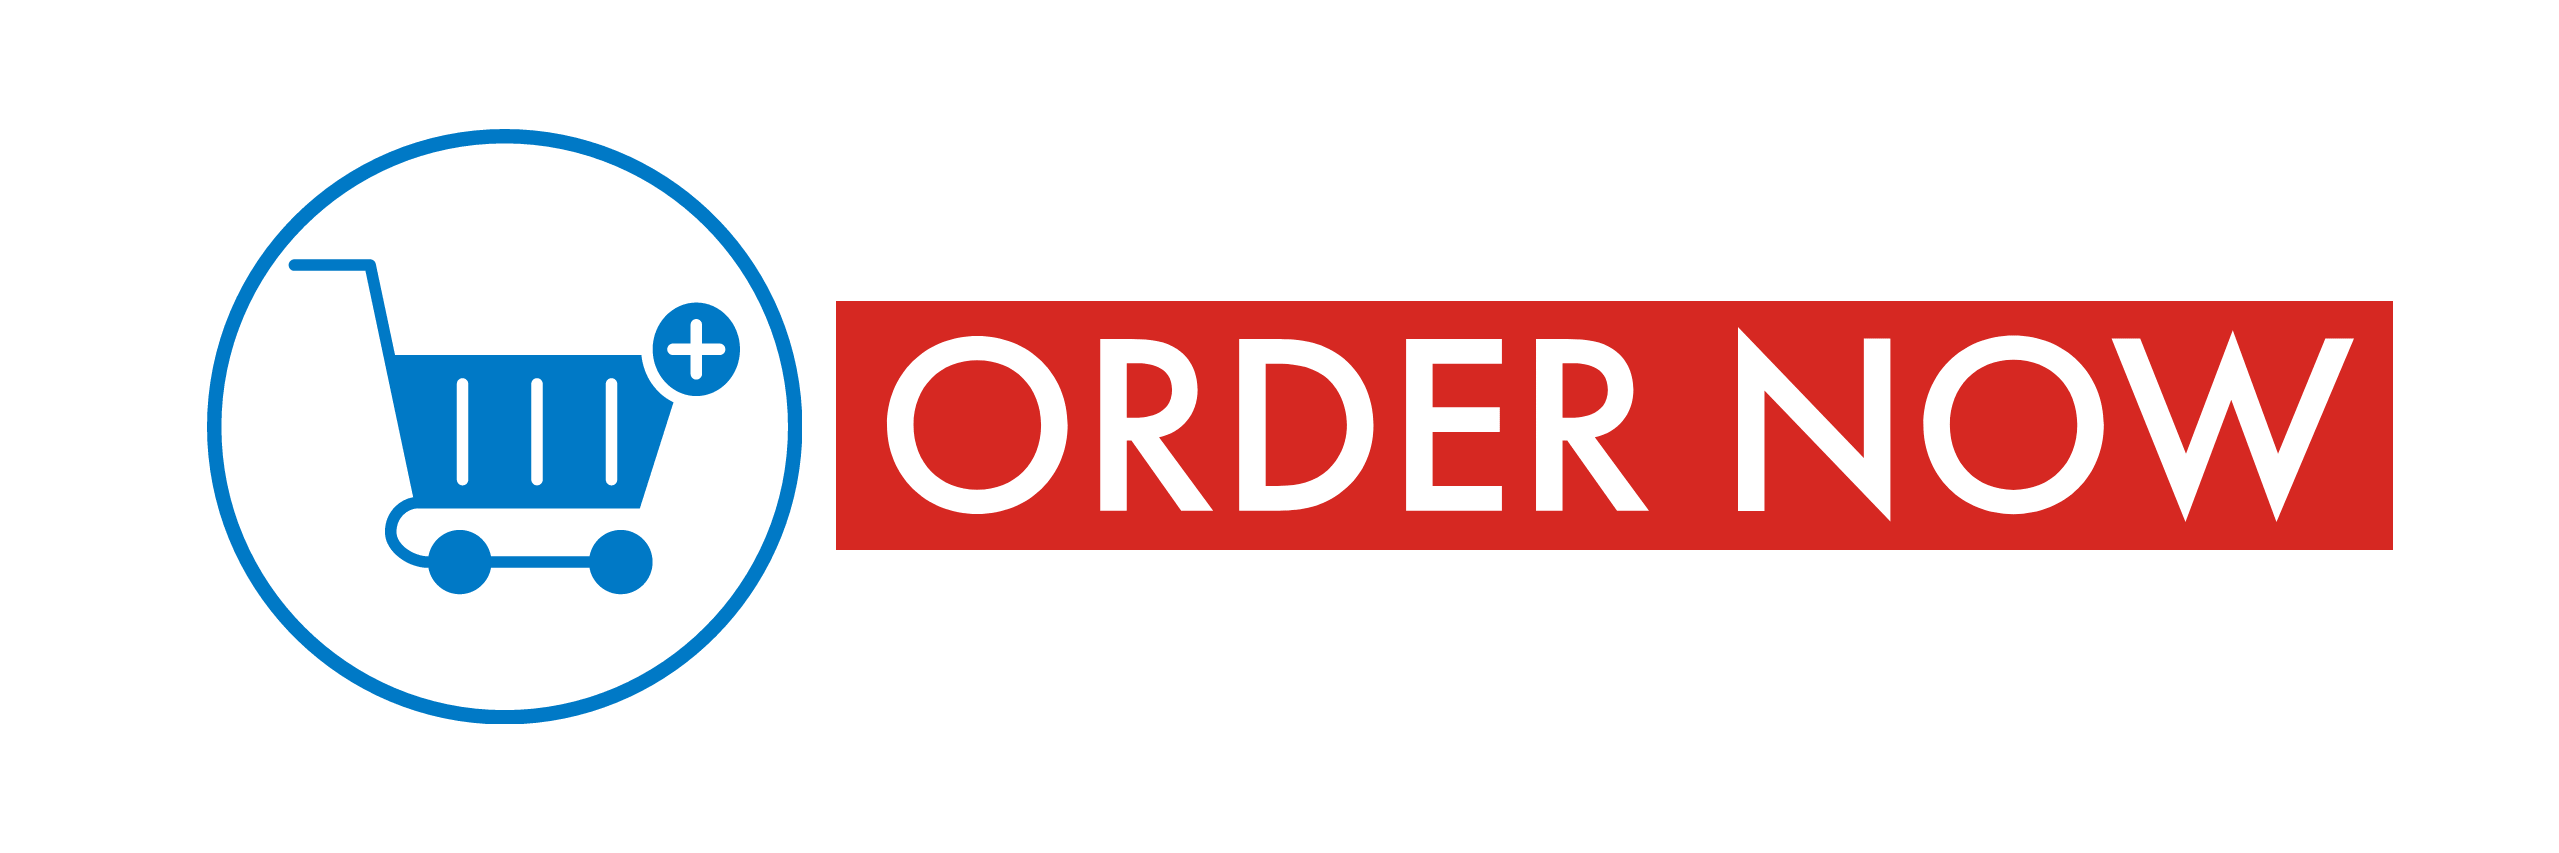 Order Now JKSSB Syllabus